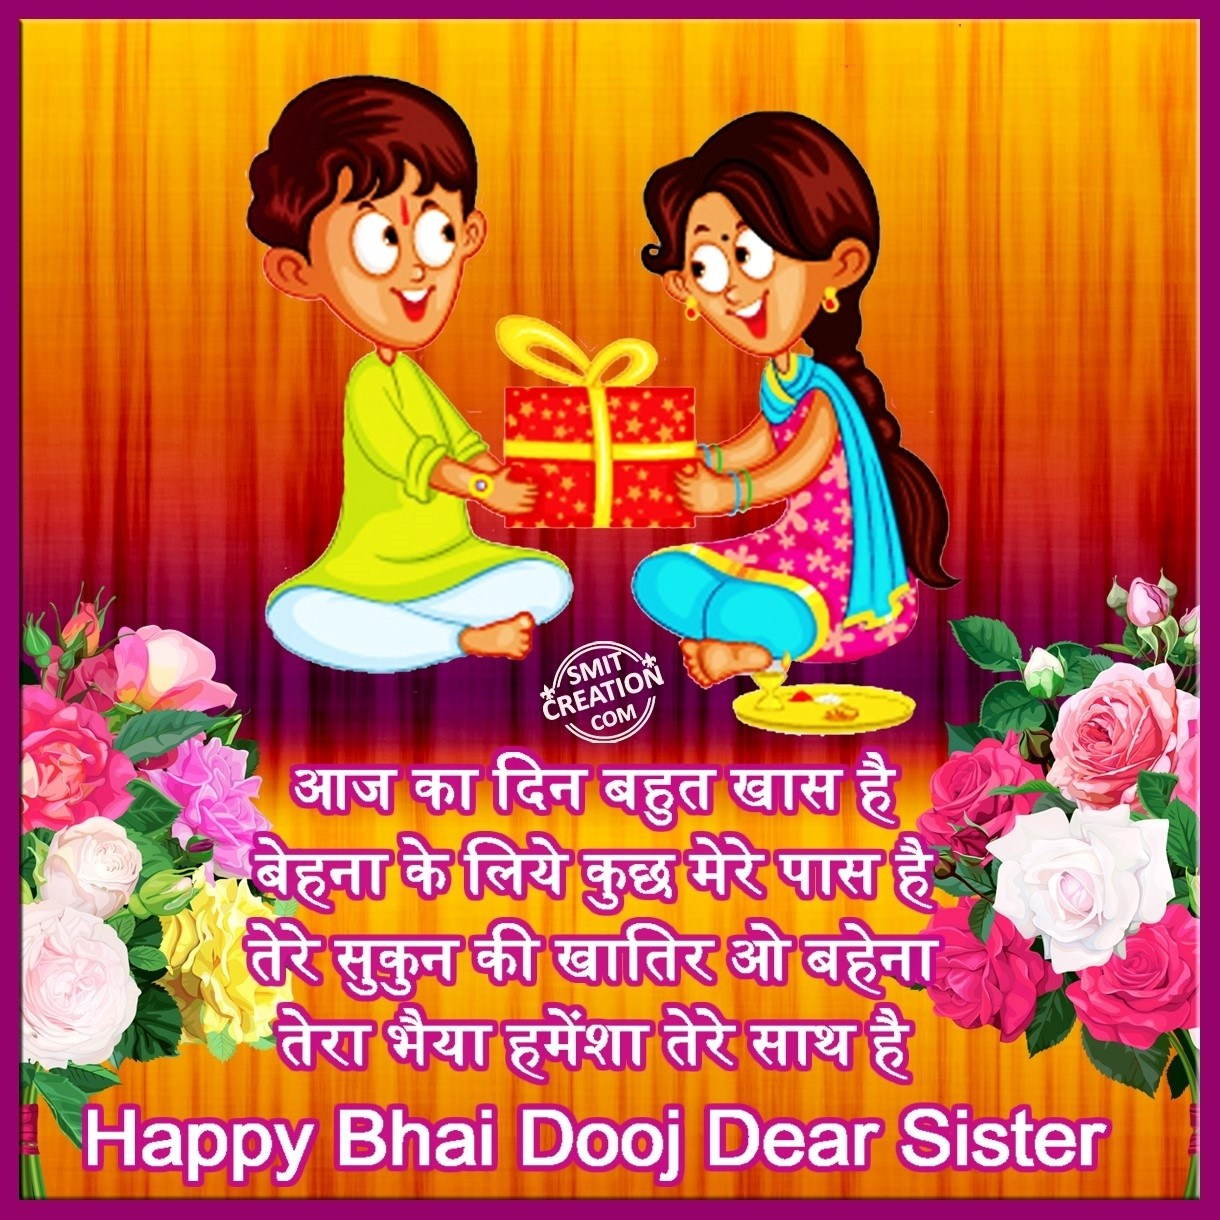 Bhai Dooj Pictures and Graphics - SmitCreation.com